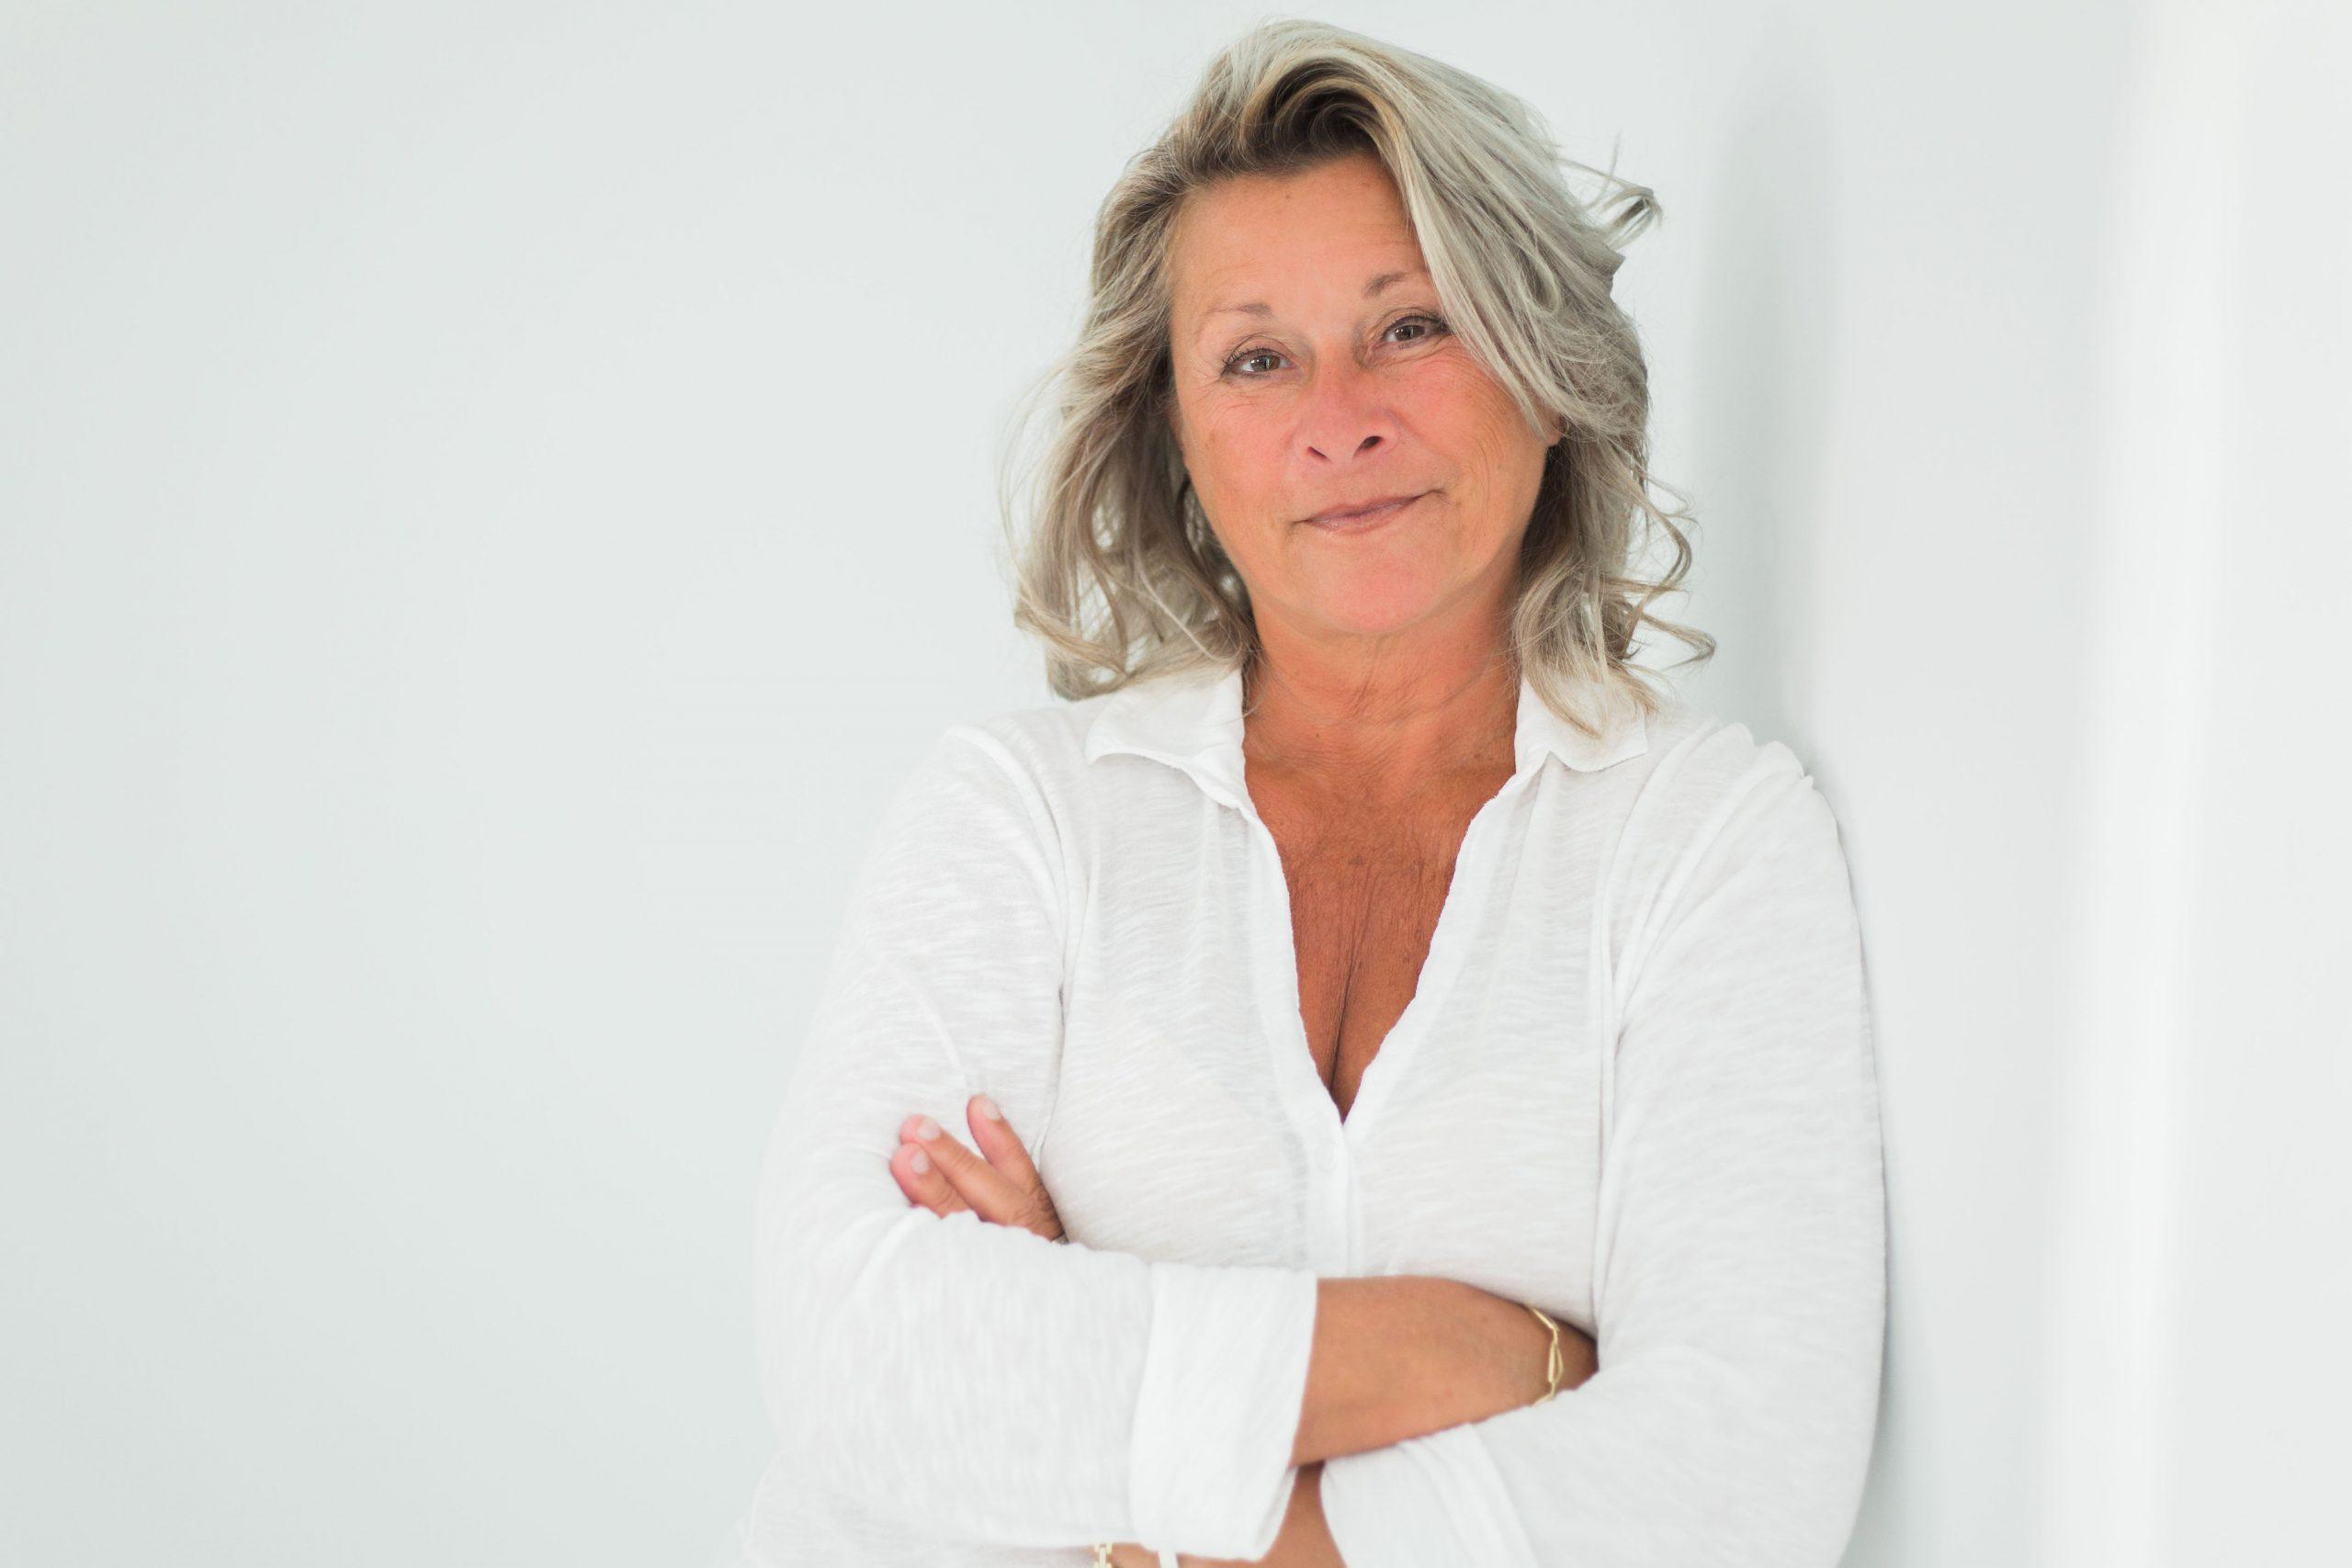 Joanna Piros